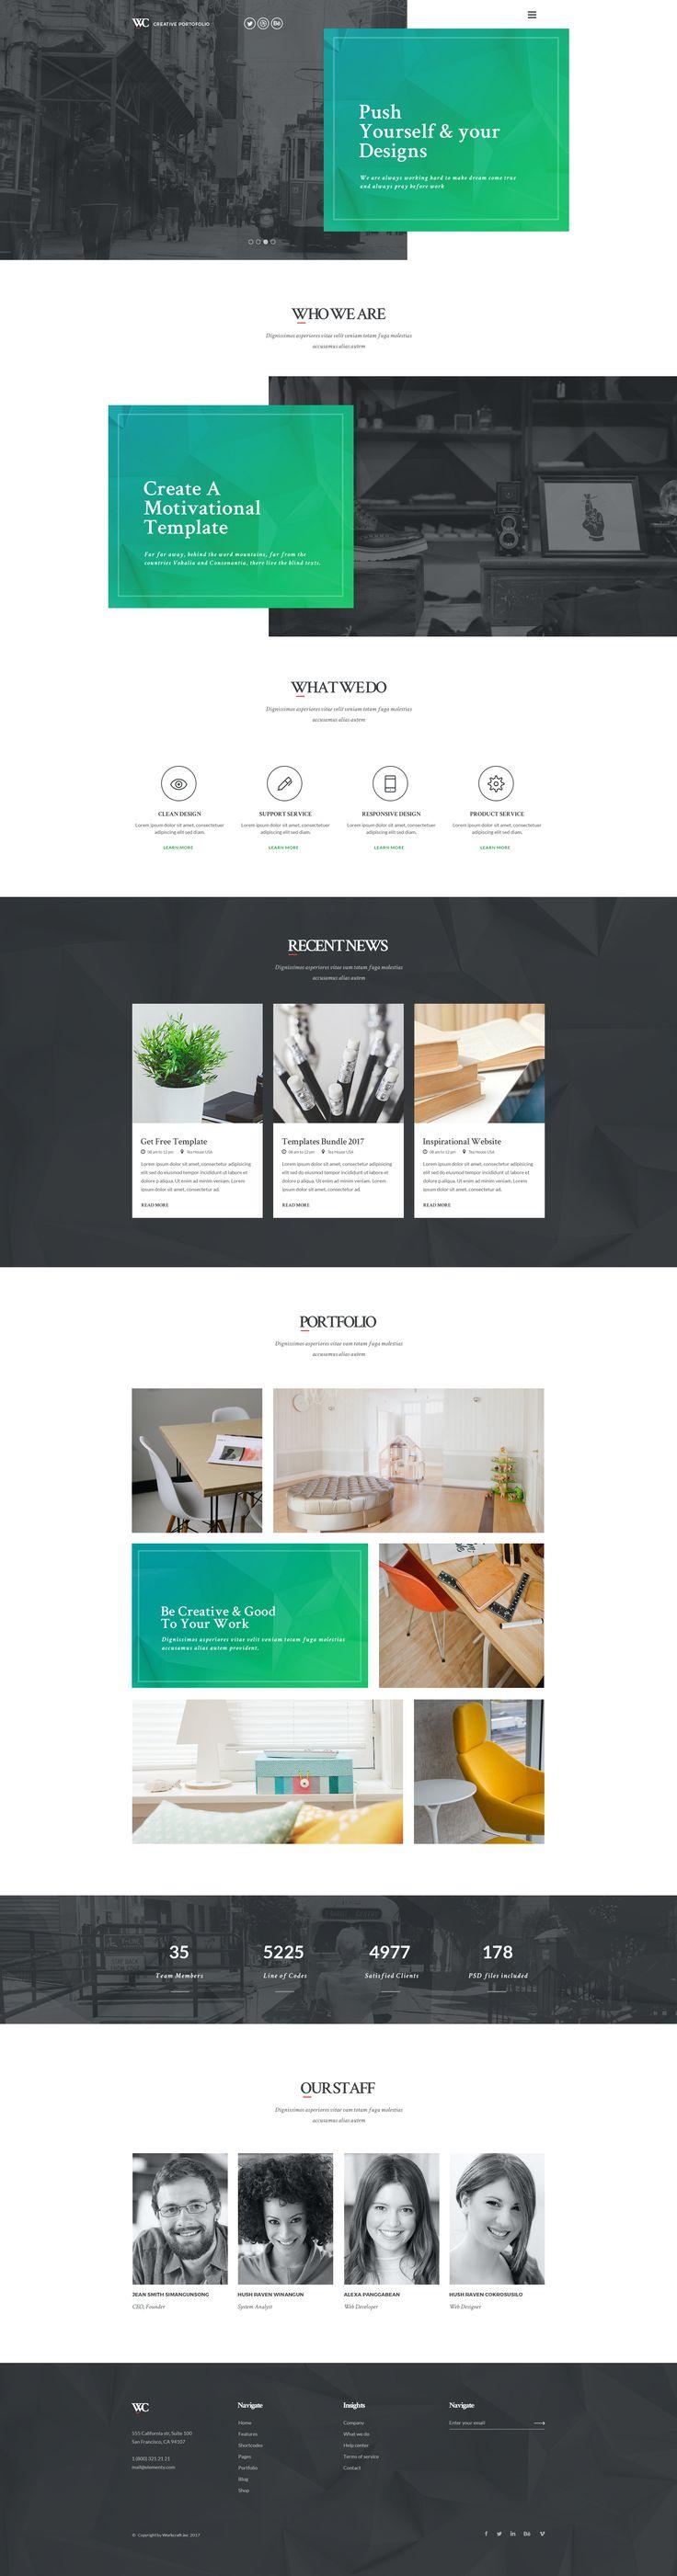 Woodcraft - One Page Creative Portfolio by vanpatelona | ThemeForest